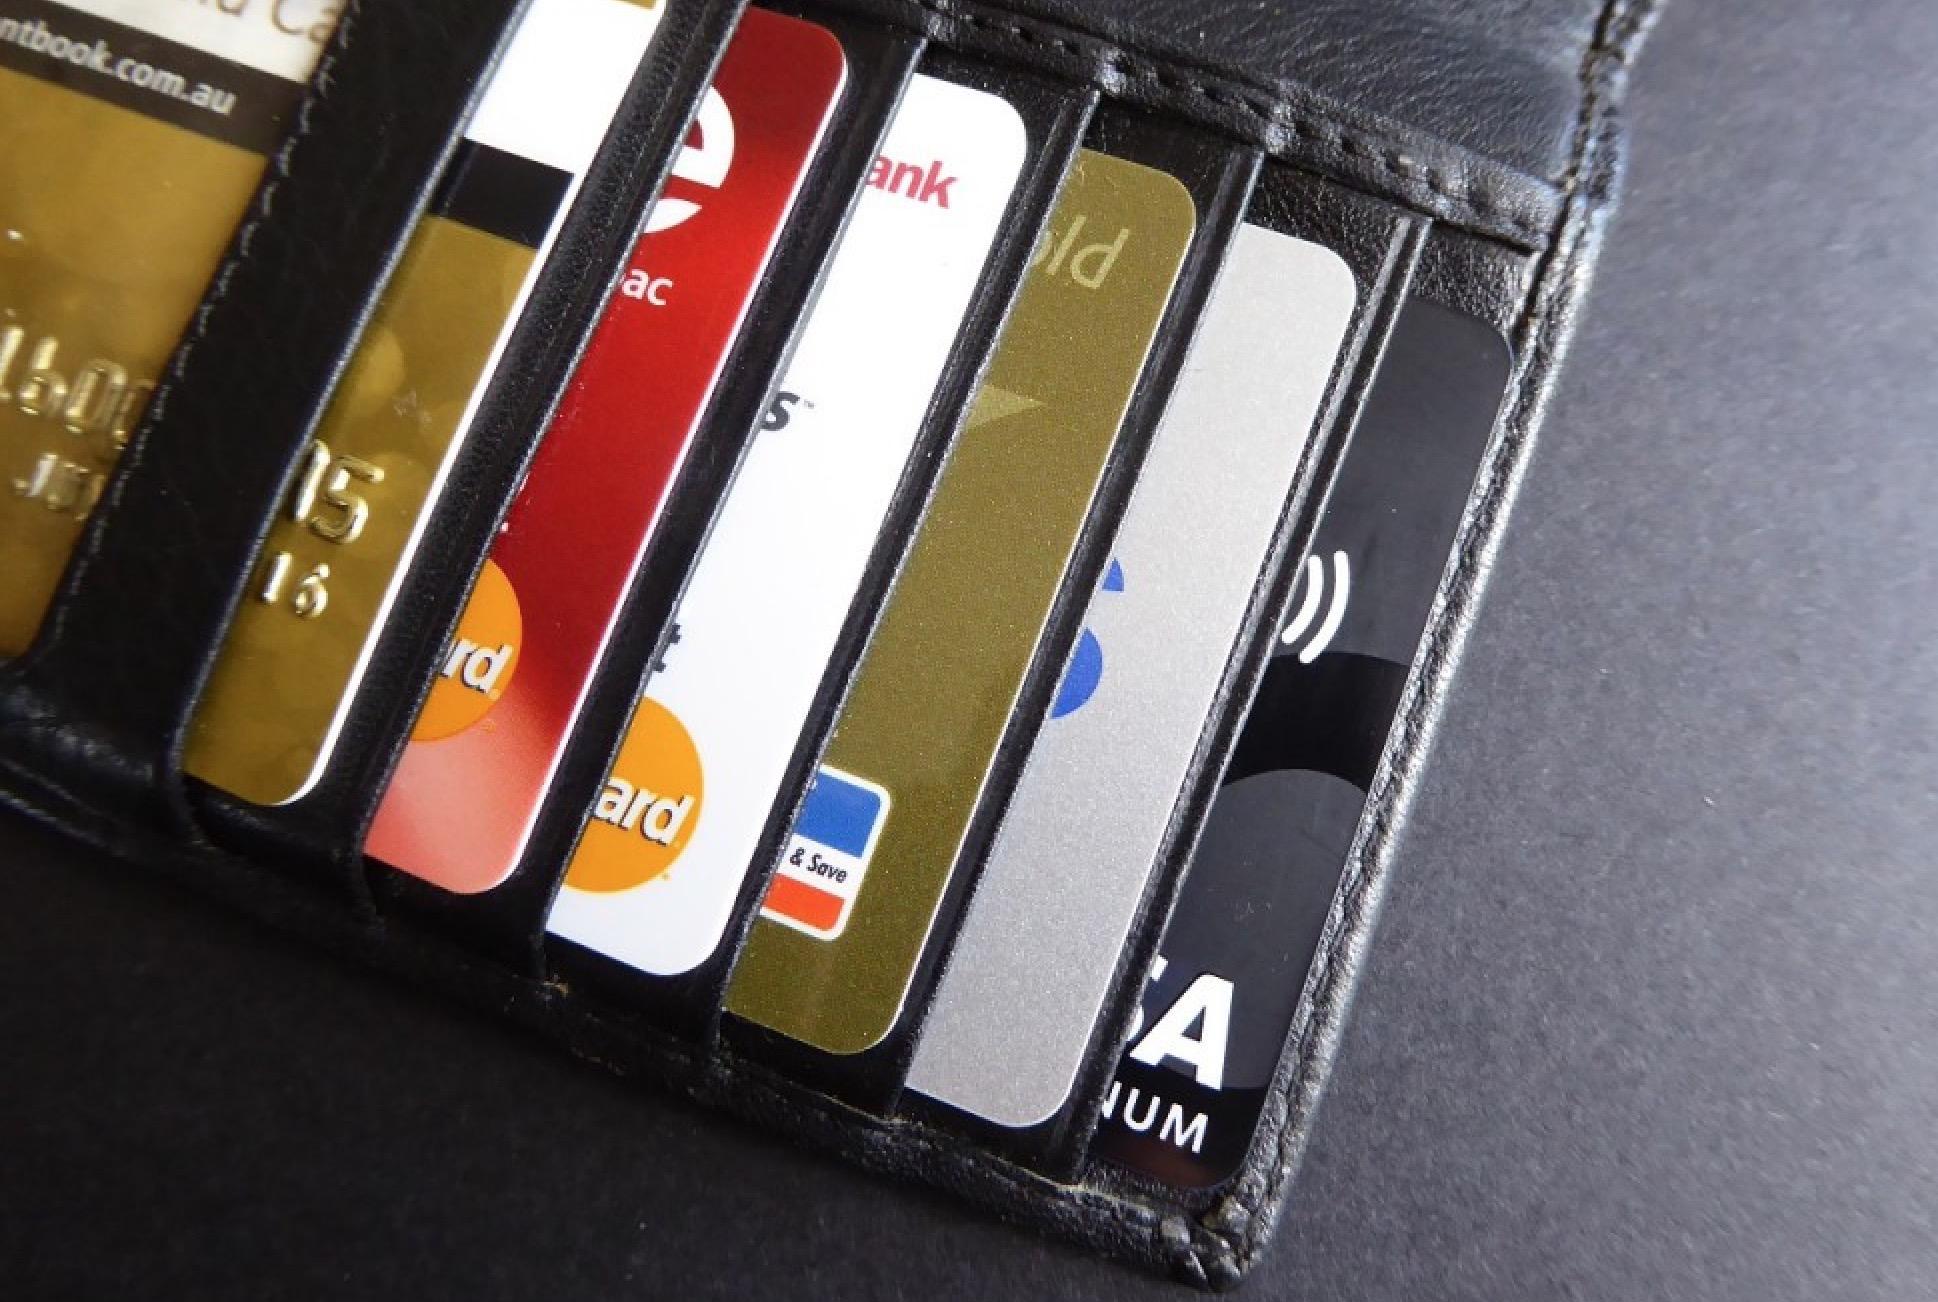 Travel Benefits of using Visa Platinum Cards - Point Hacks